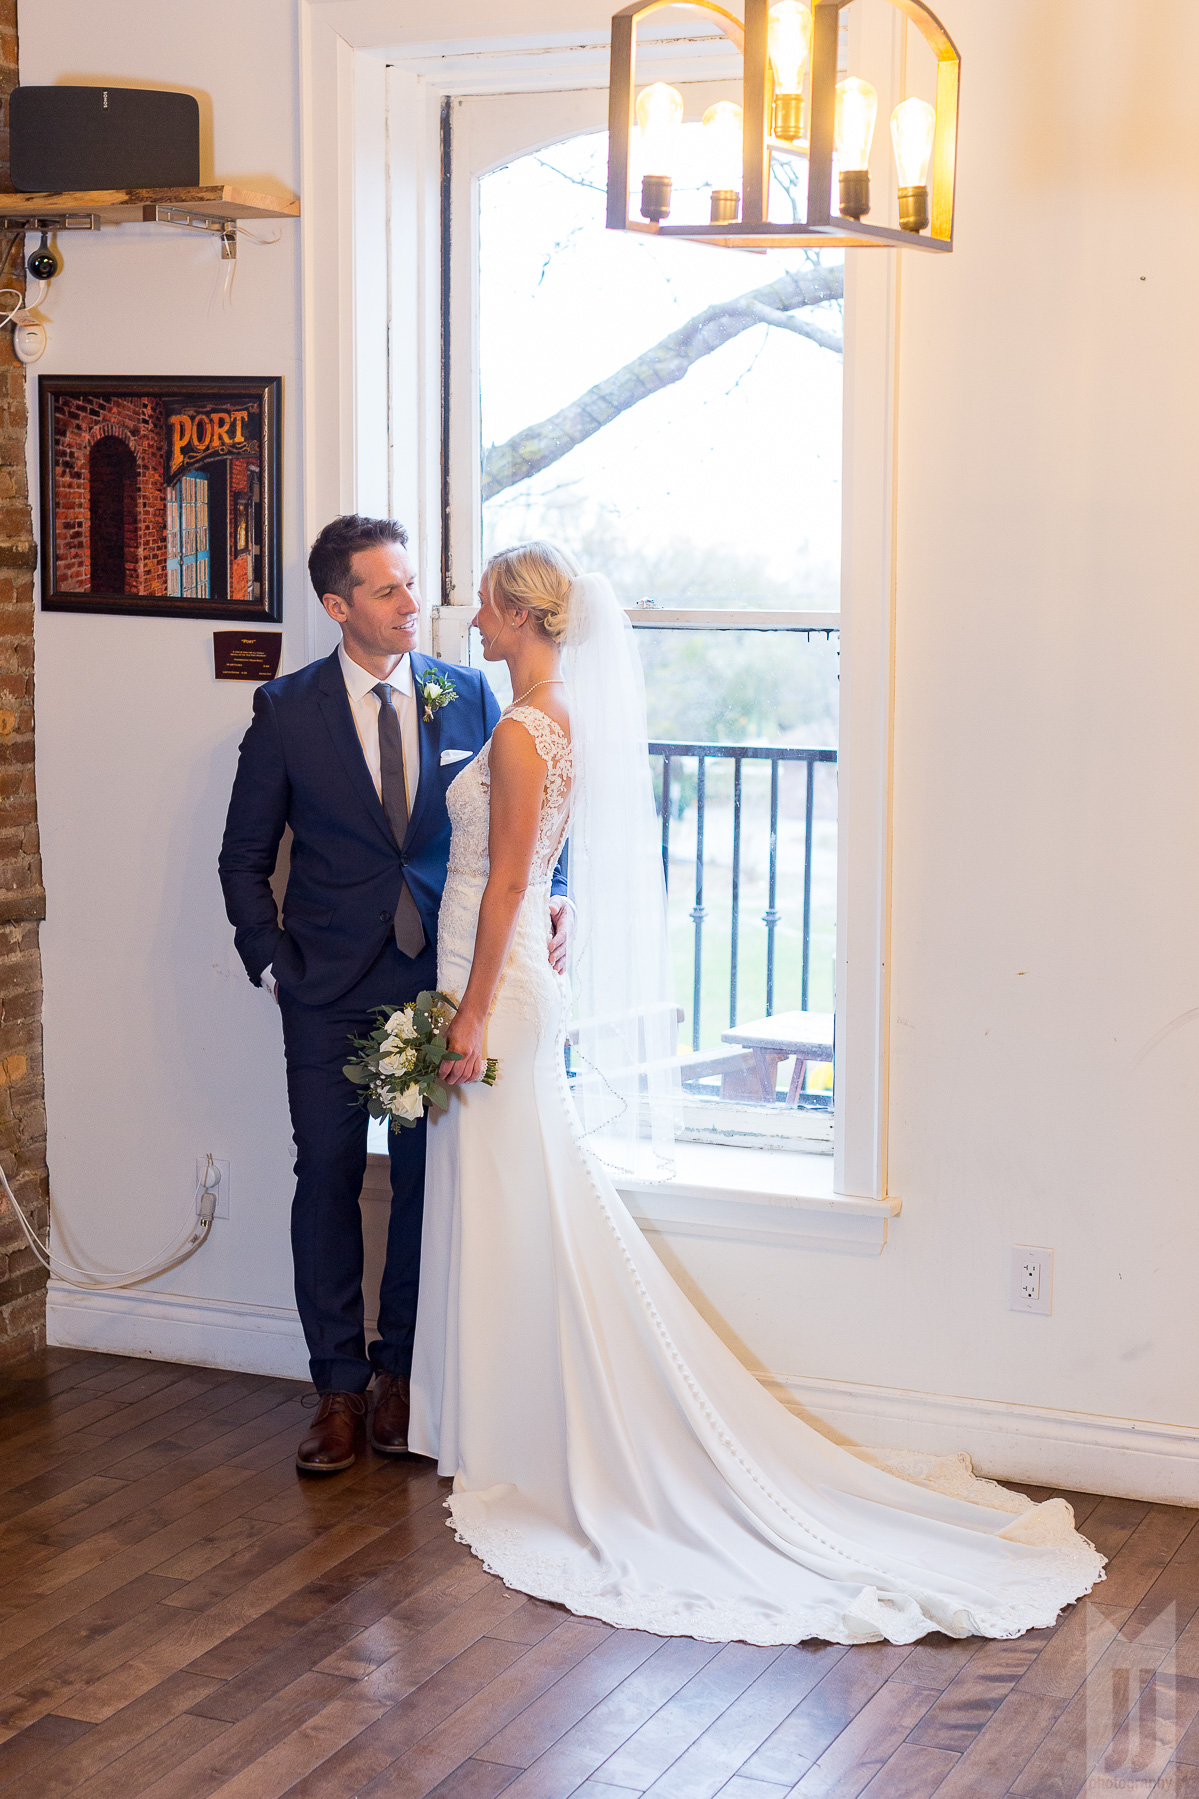 RL_Wedding_Tall-7.jpg